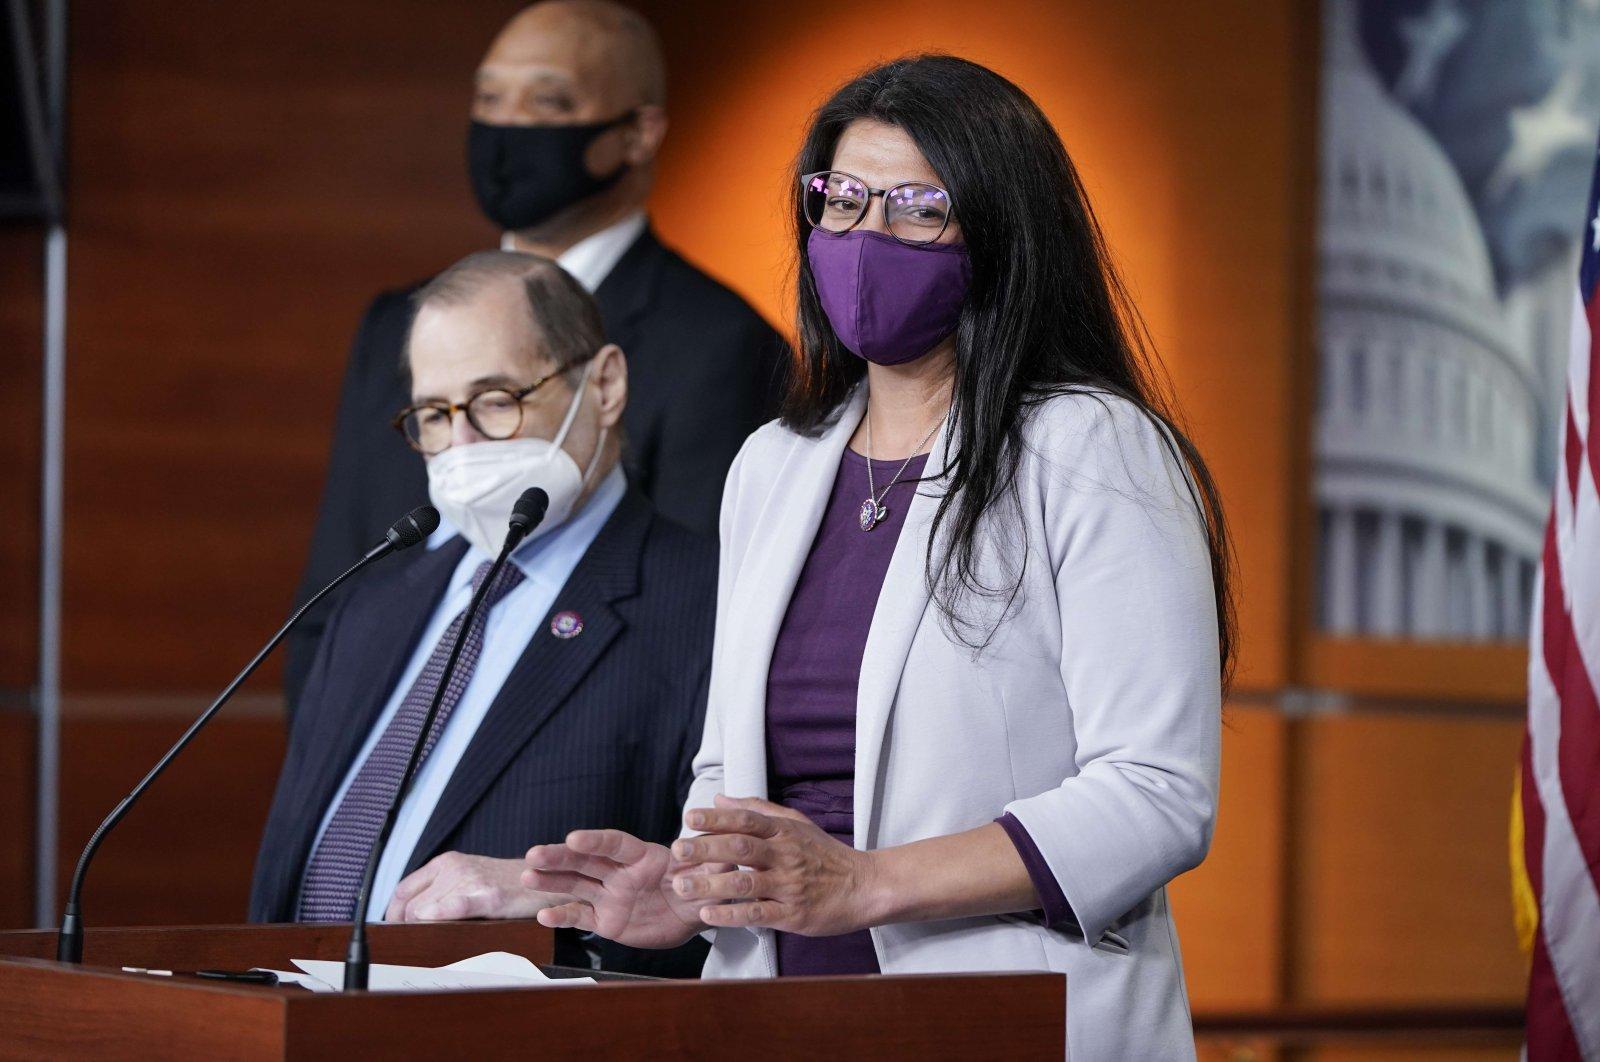 Rep. Rashida Tlaib (R) speaks during a news conference, April 21, 2021 in Washington, DC, U.S. (Joshua Roberts/Getty Images/AFP)